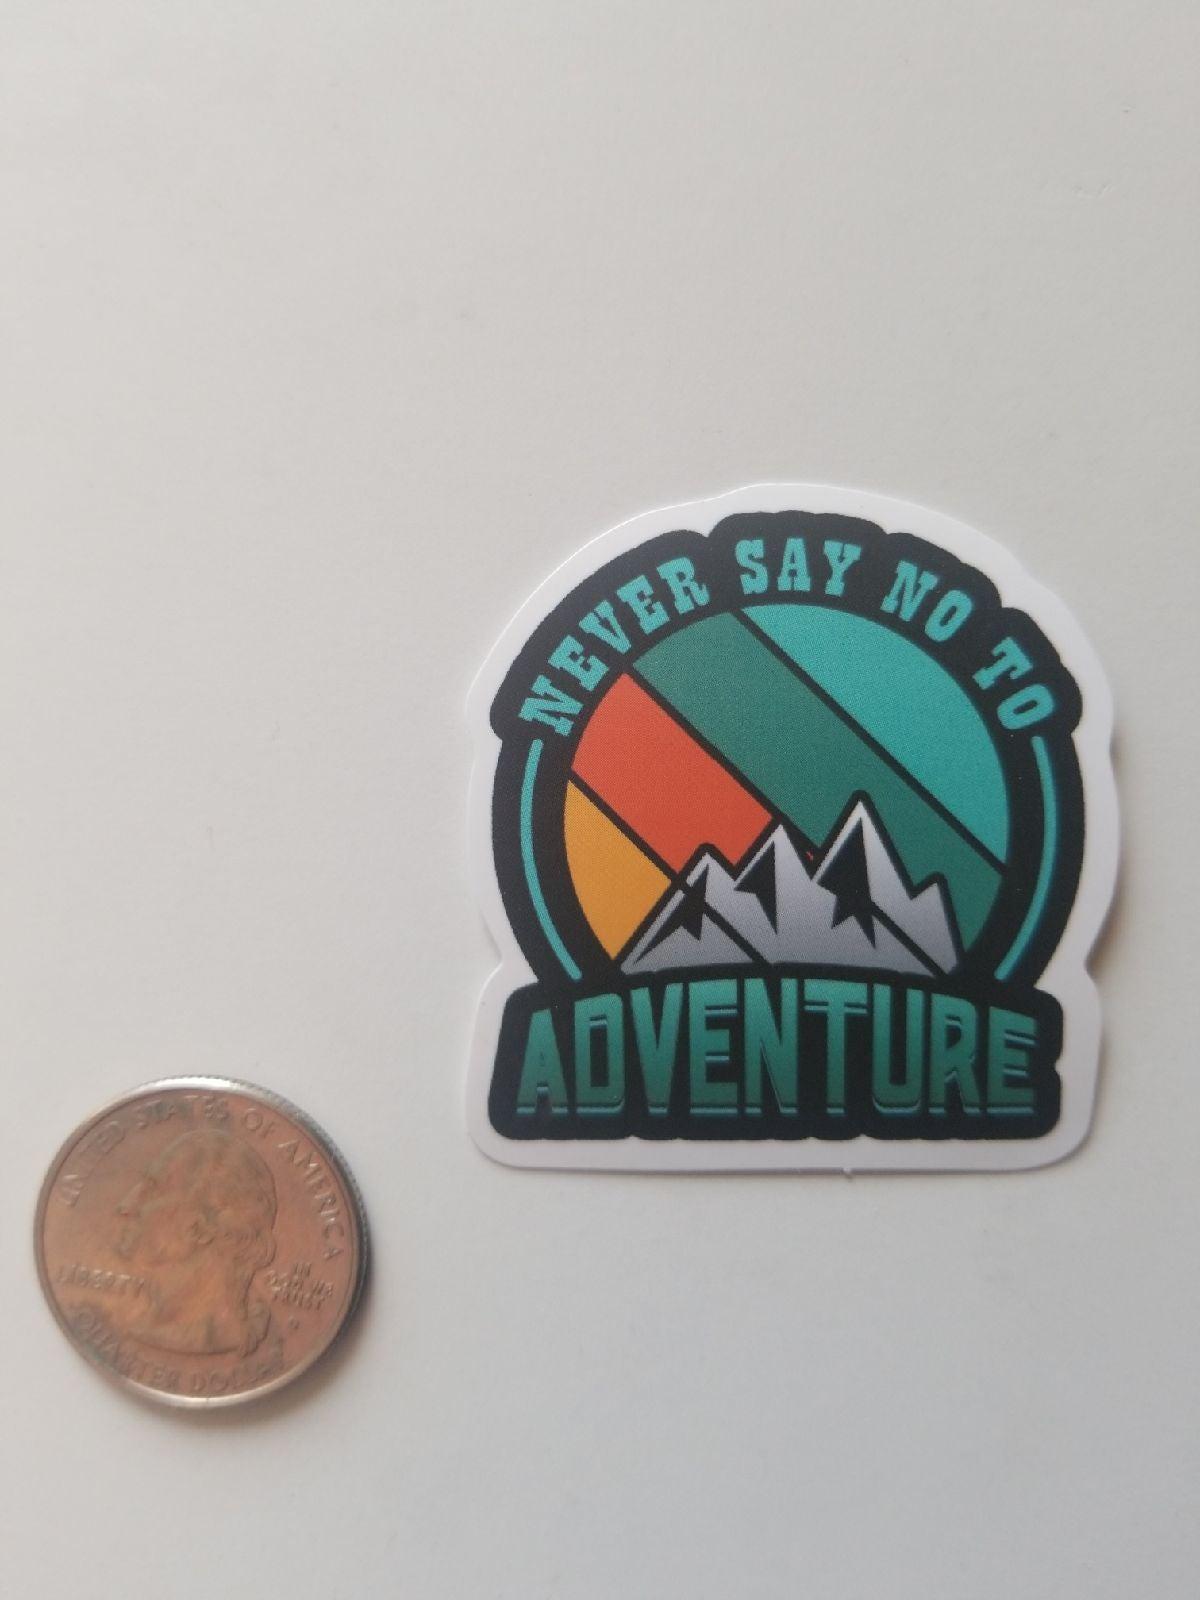 Adventure never say no camping wildernes